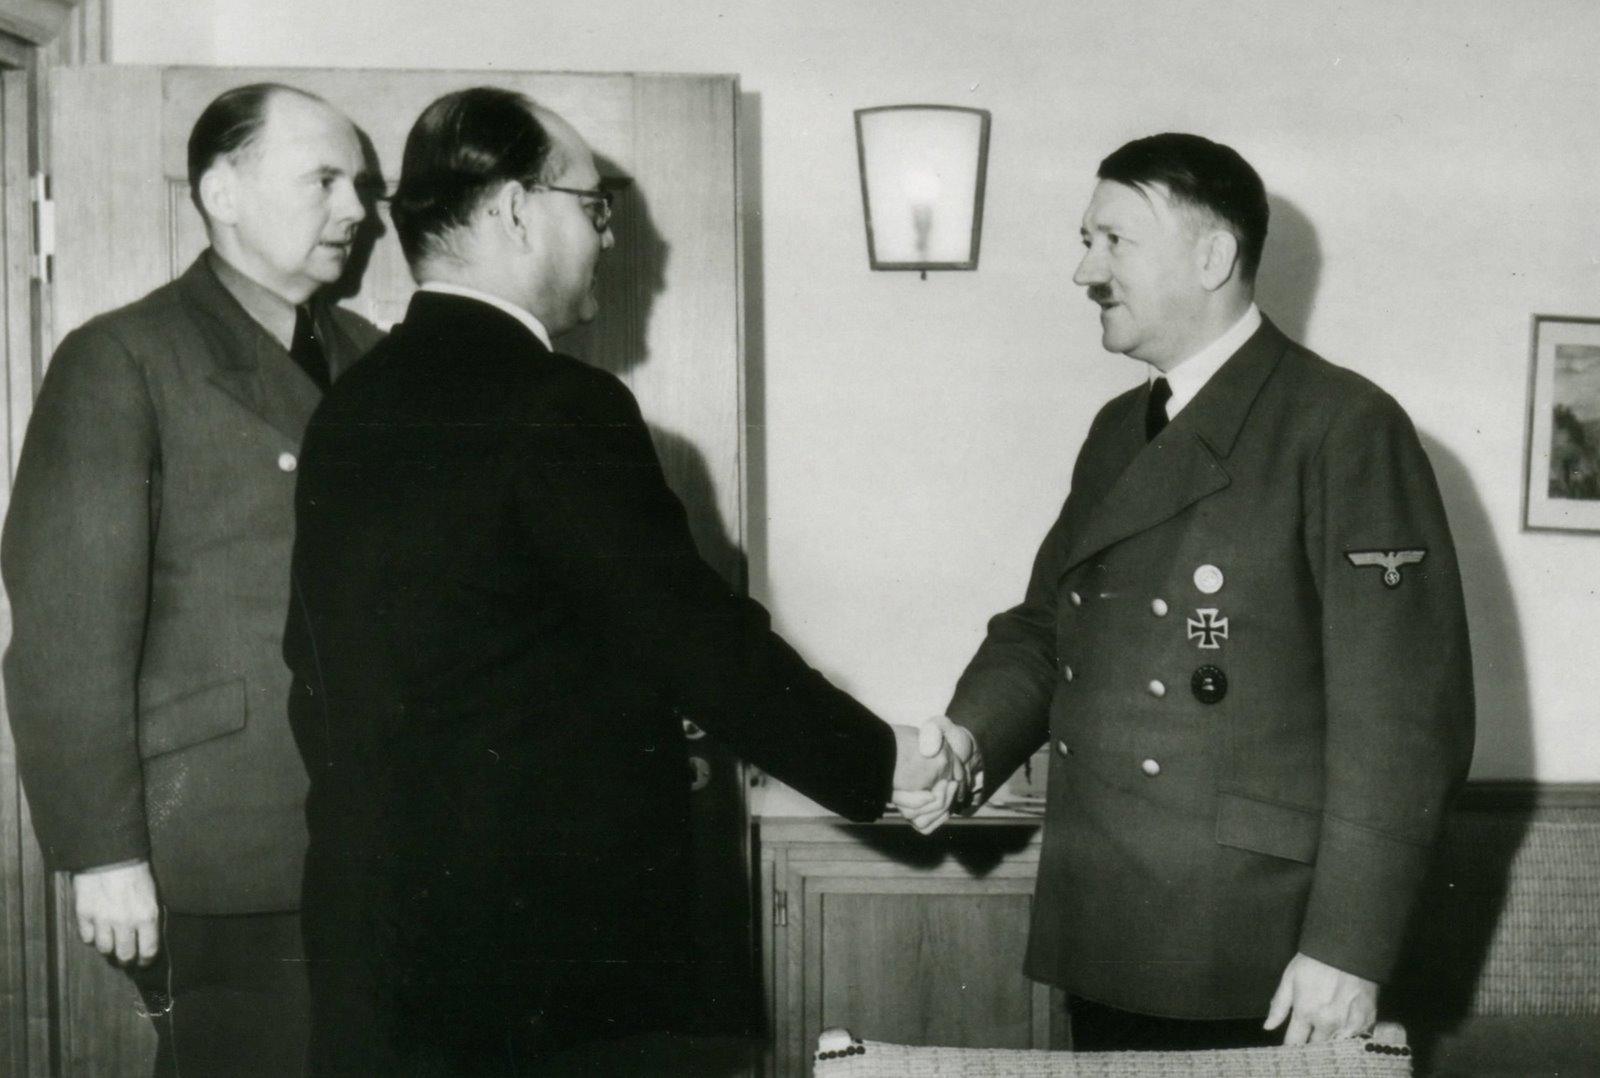 Adolf Hitler, Gandhi, Independence of India, ww2, world war, British, nazi, Germany, Netaji Subhashchandra Bose, indian Conspiracy, india freedom